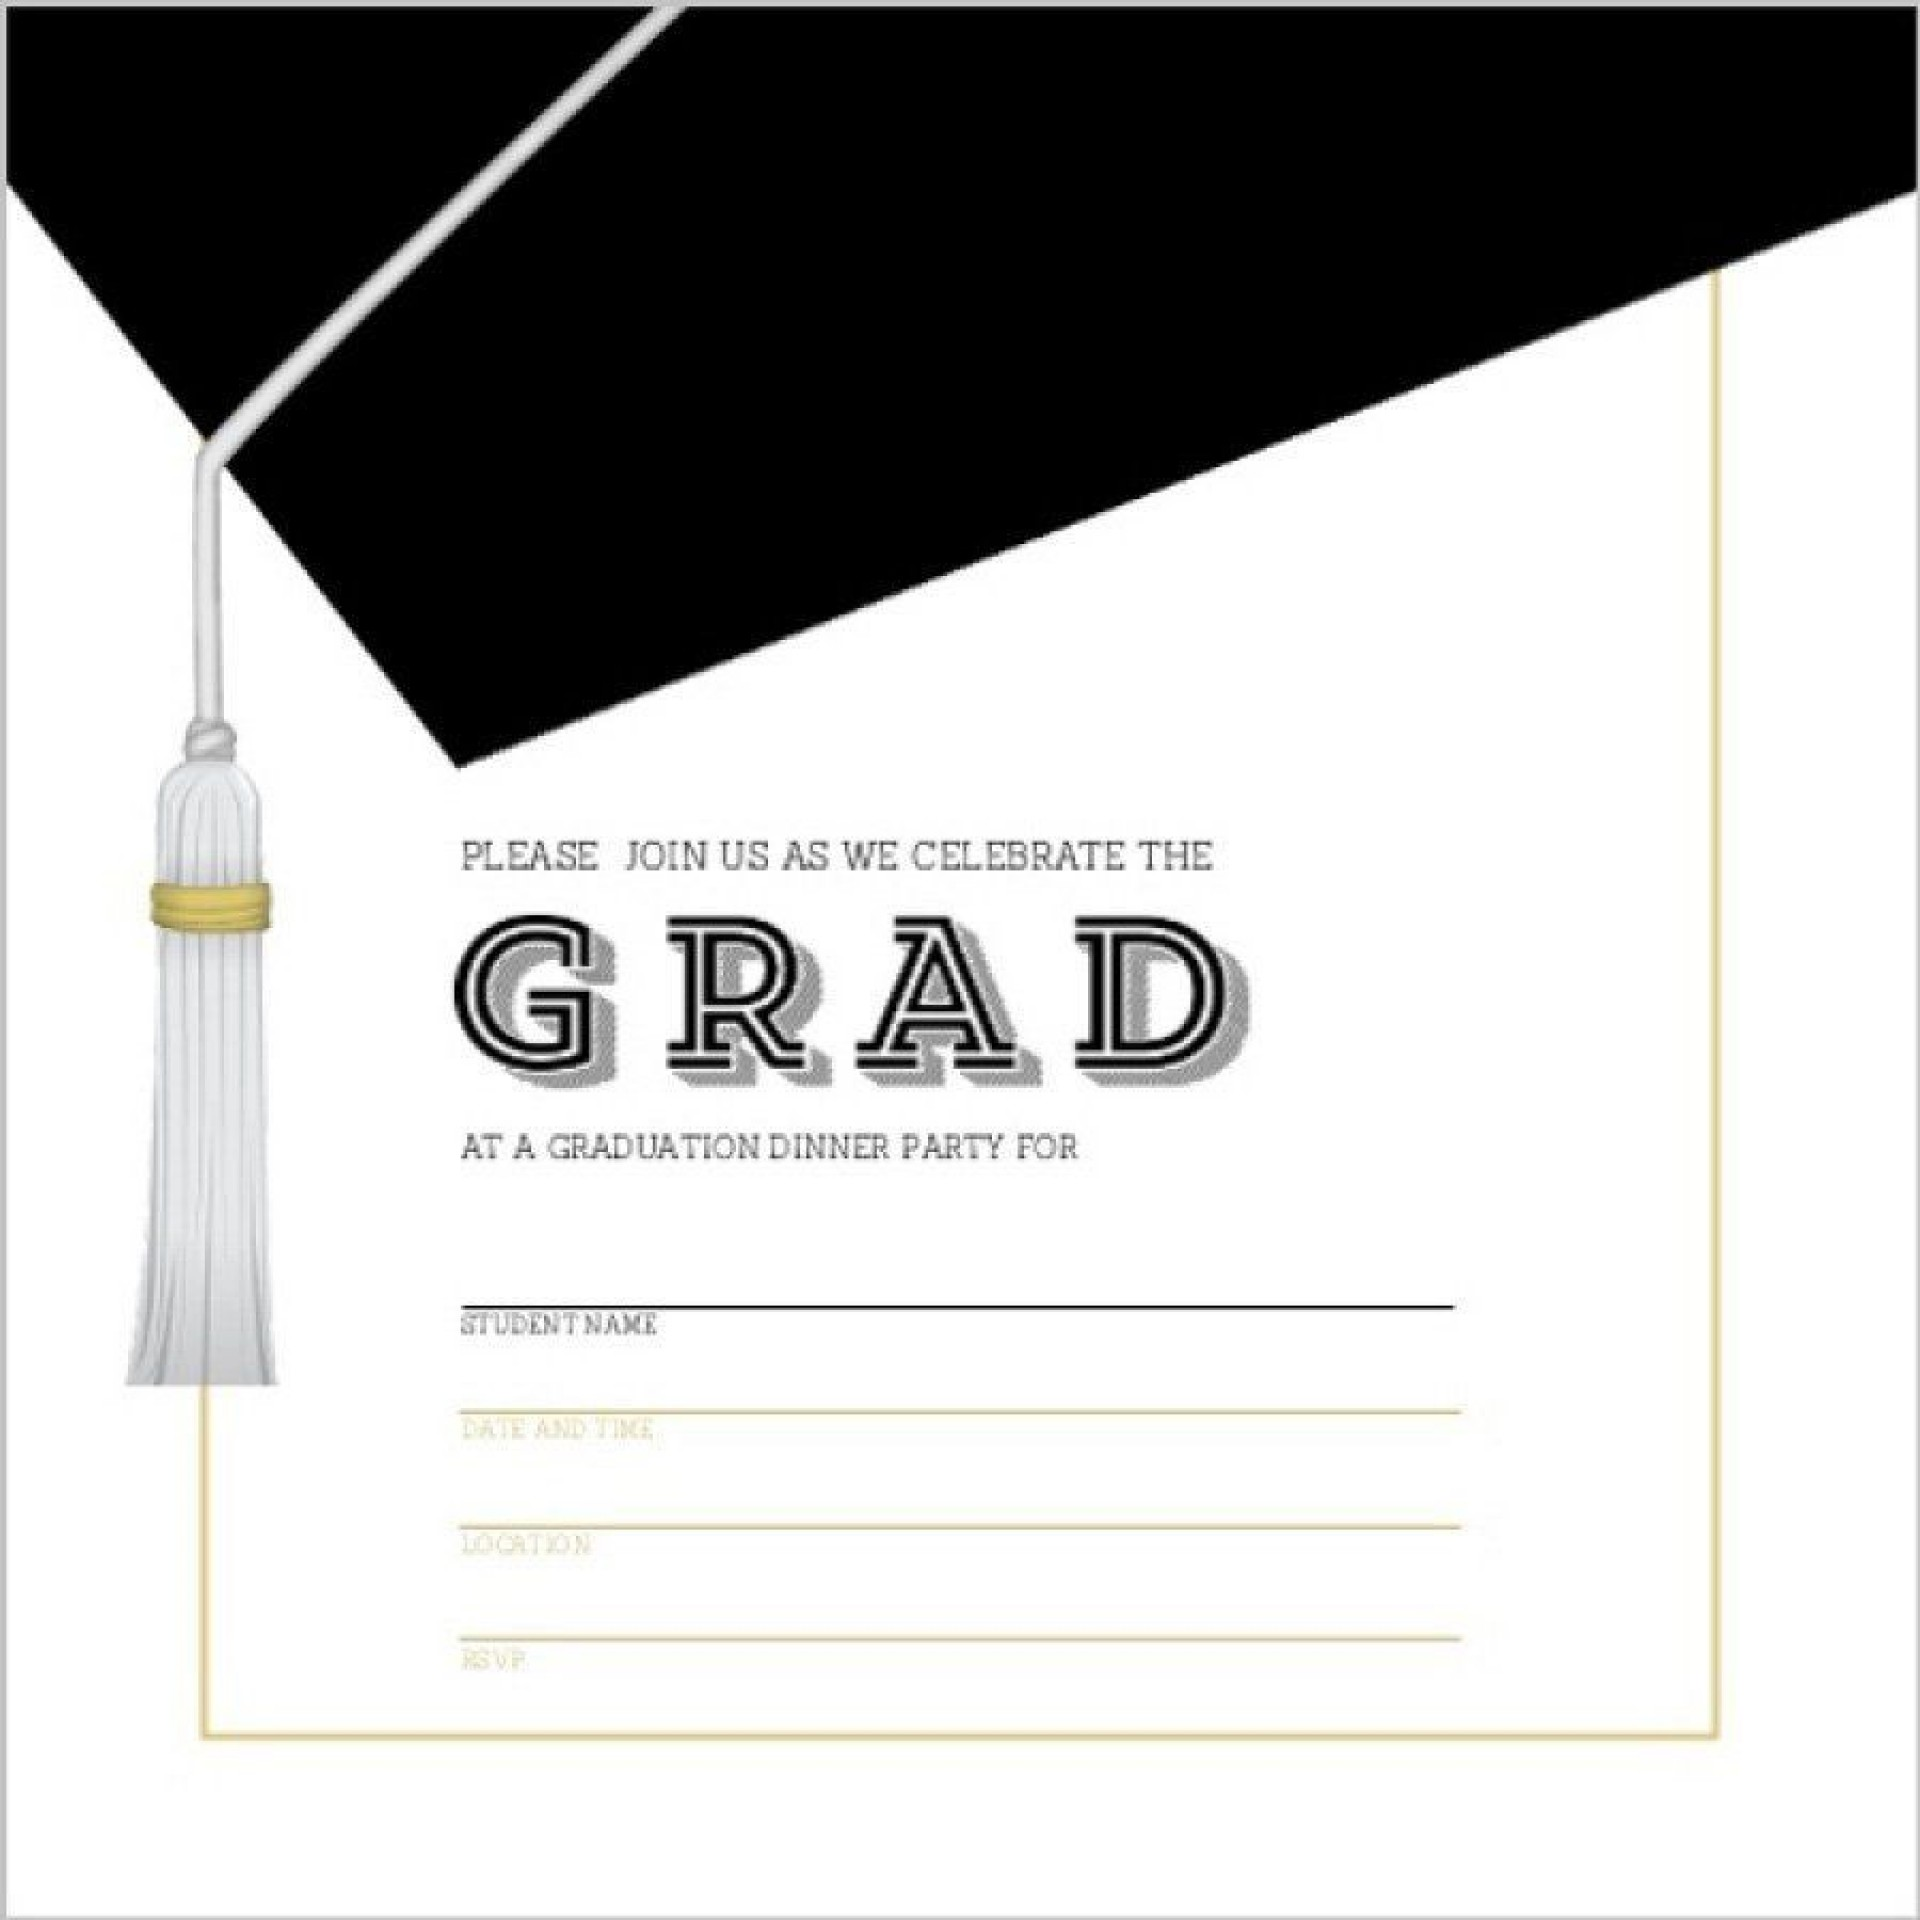 002 Unique Microsoft Word Graduation Invitation Template High Definition  Party1920